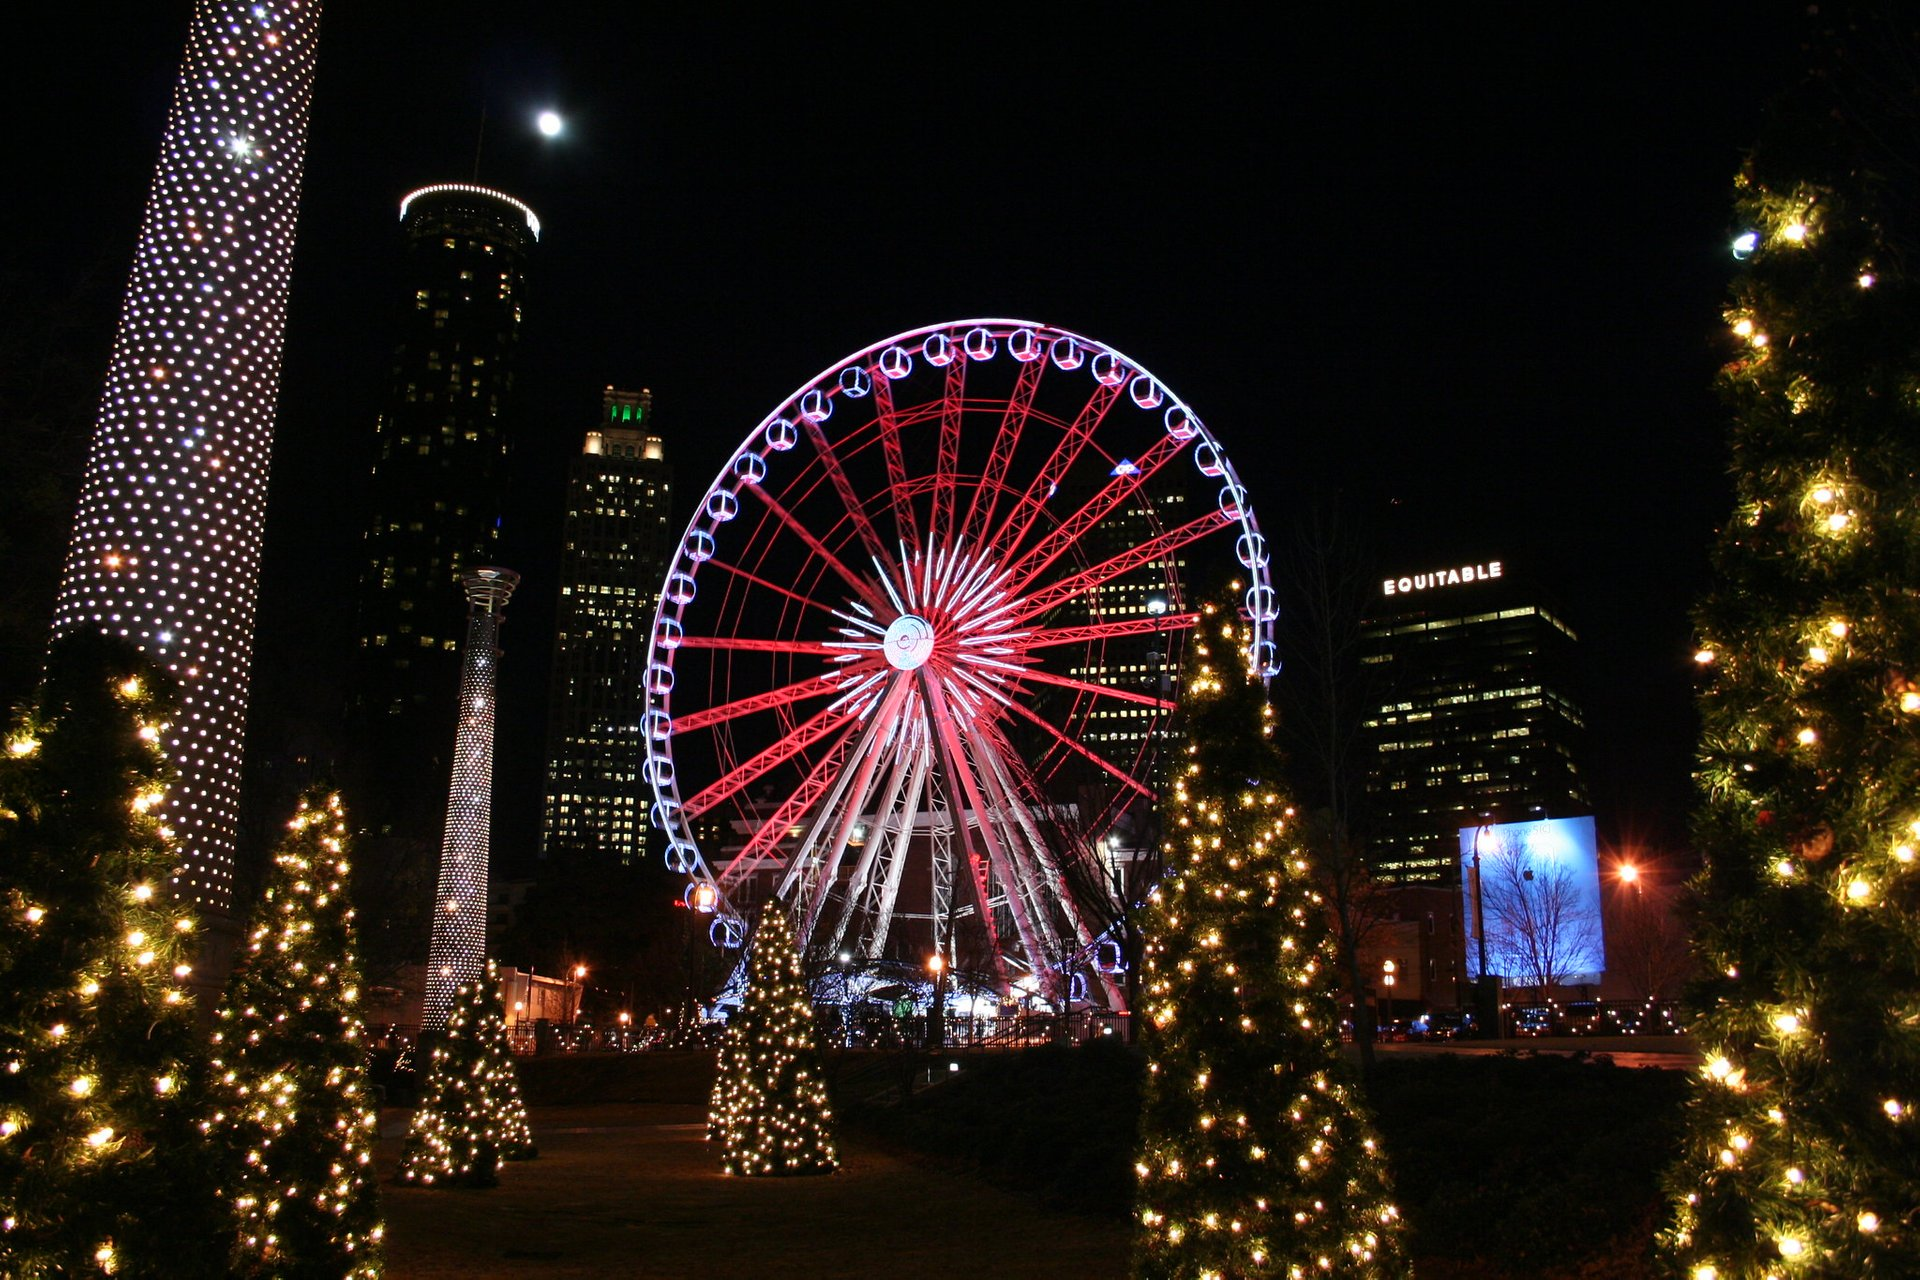 Christmas at Centennial Olympic Park 2020